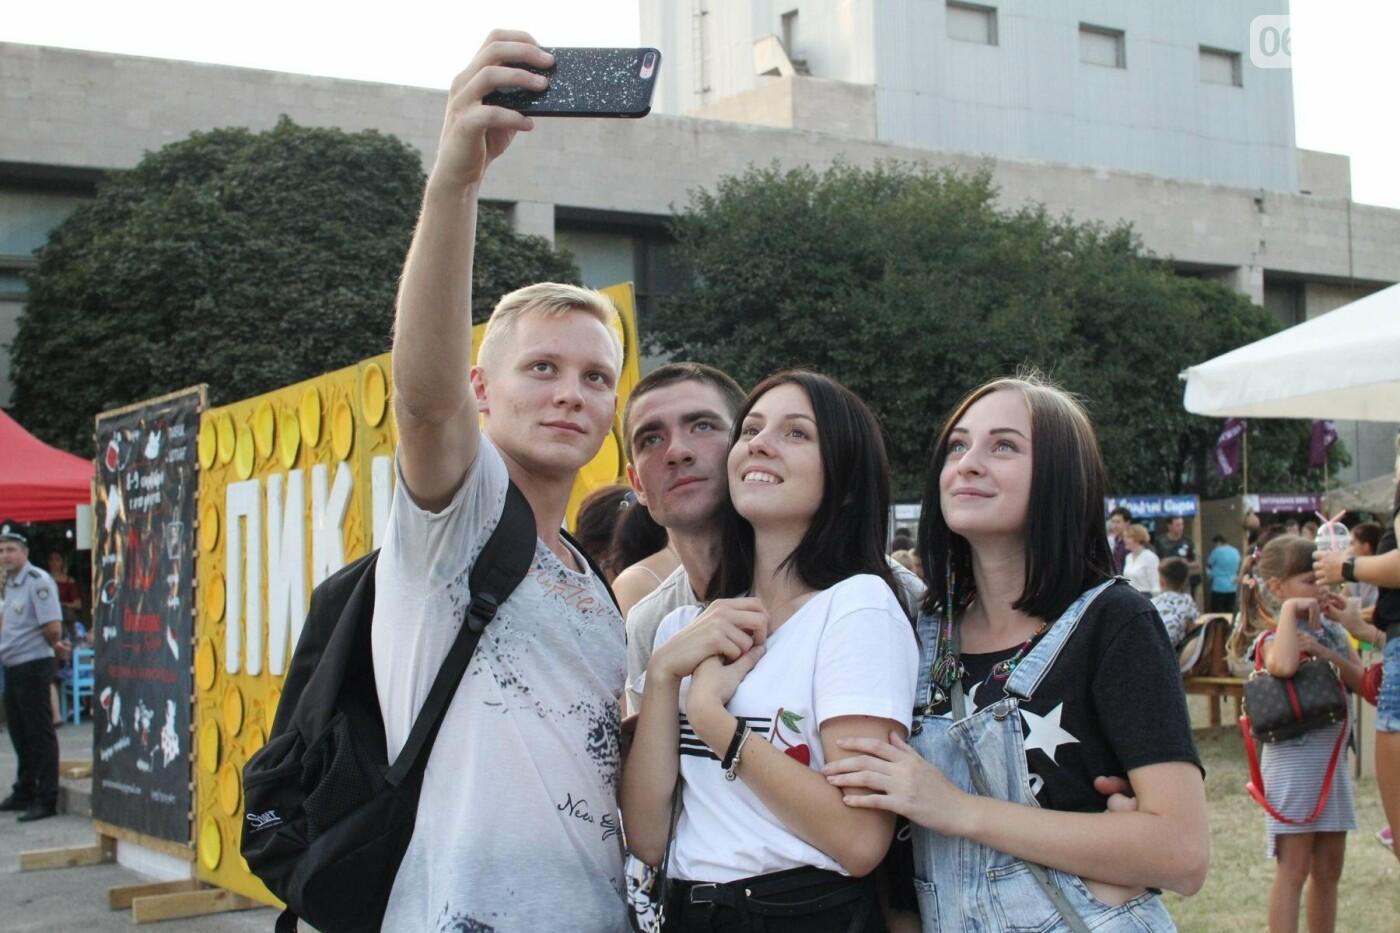 Найди себя: 50 портретов посетителей фестиваля Khortytsia Freedom, – ФОТОРЕПОРТАЖ, фото-26